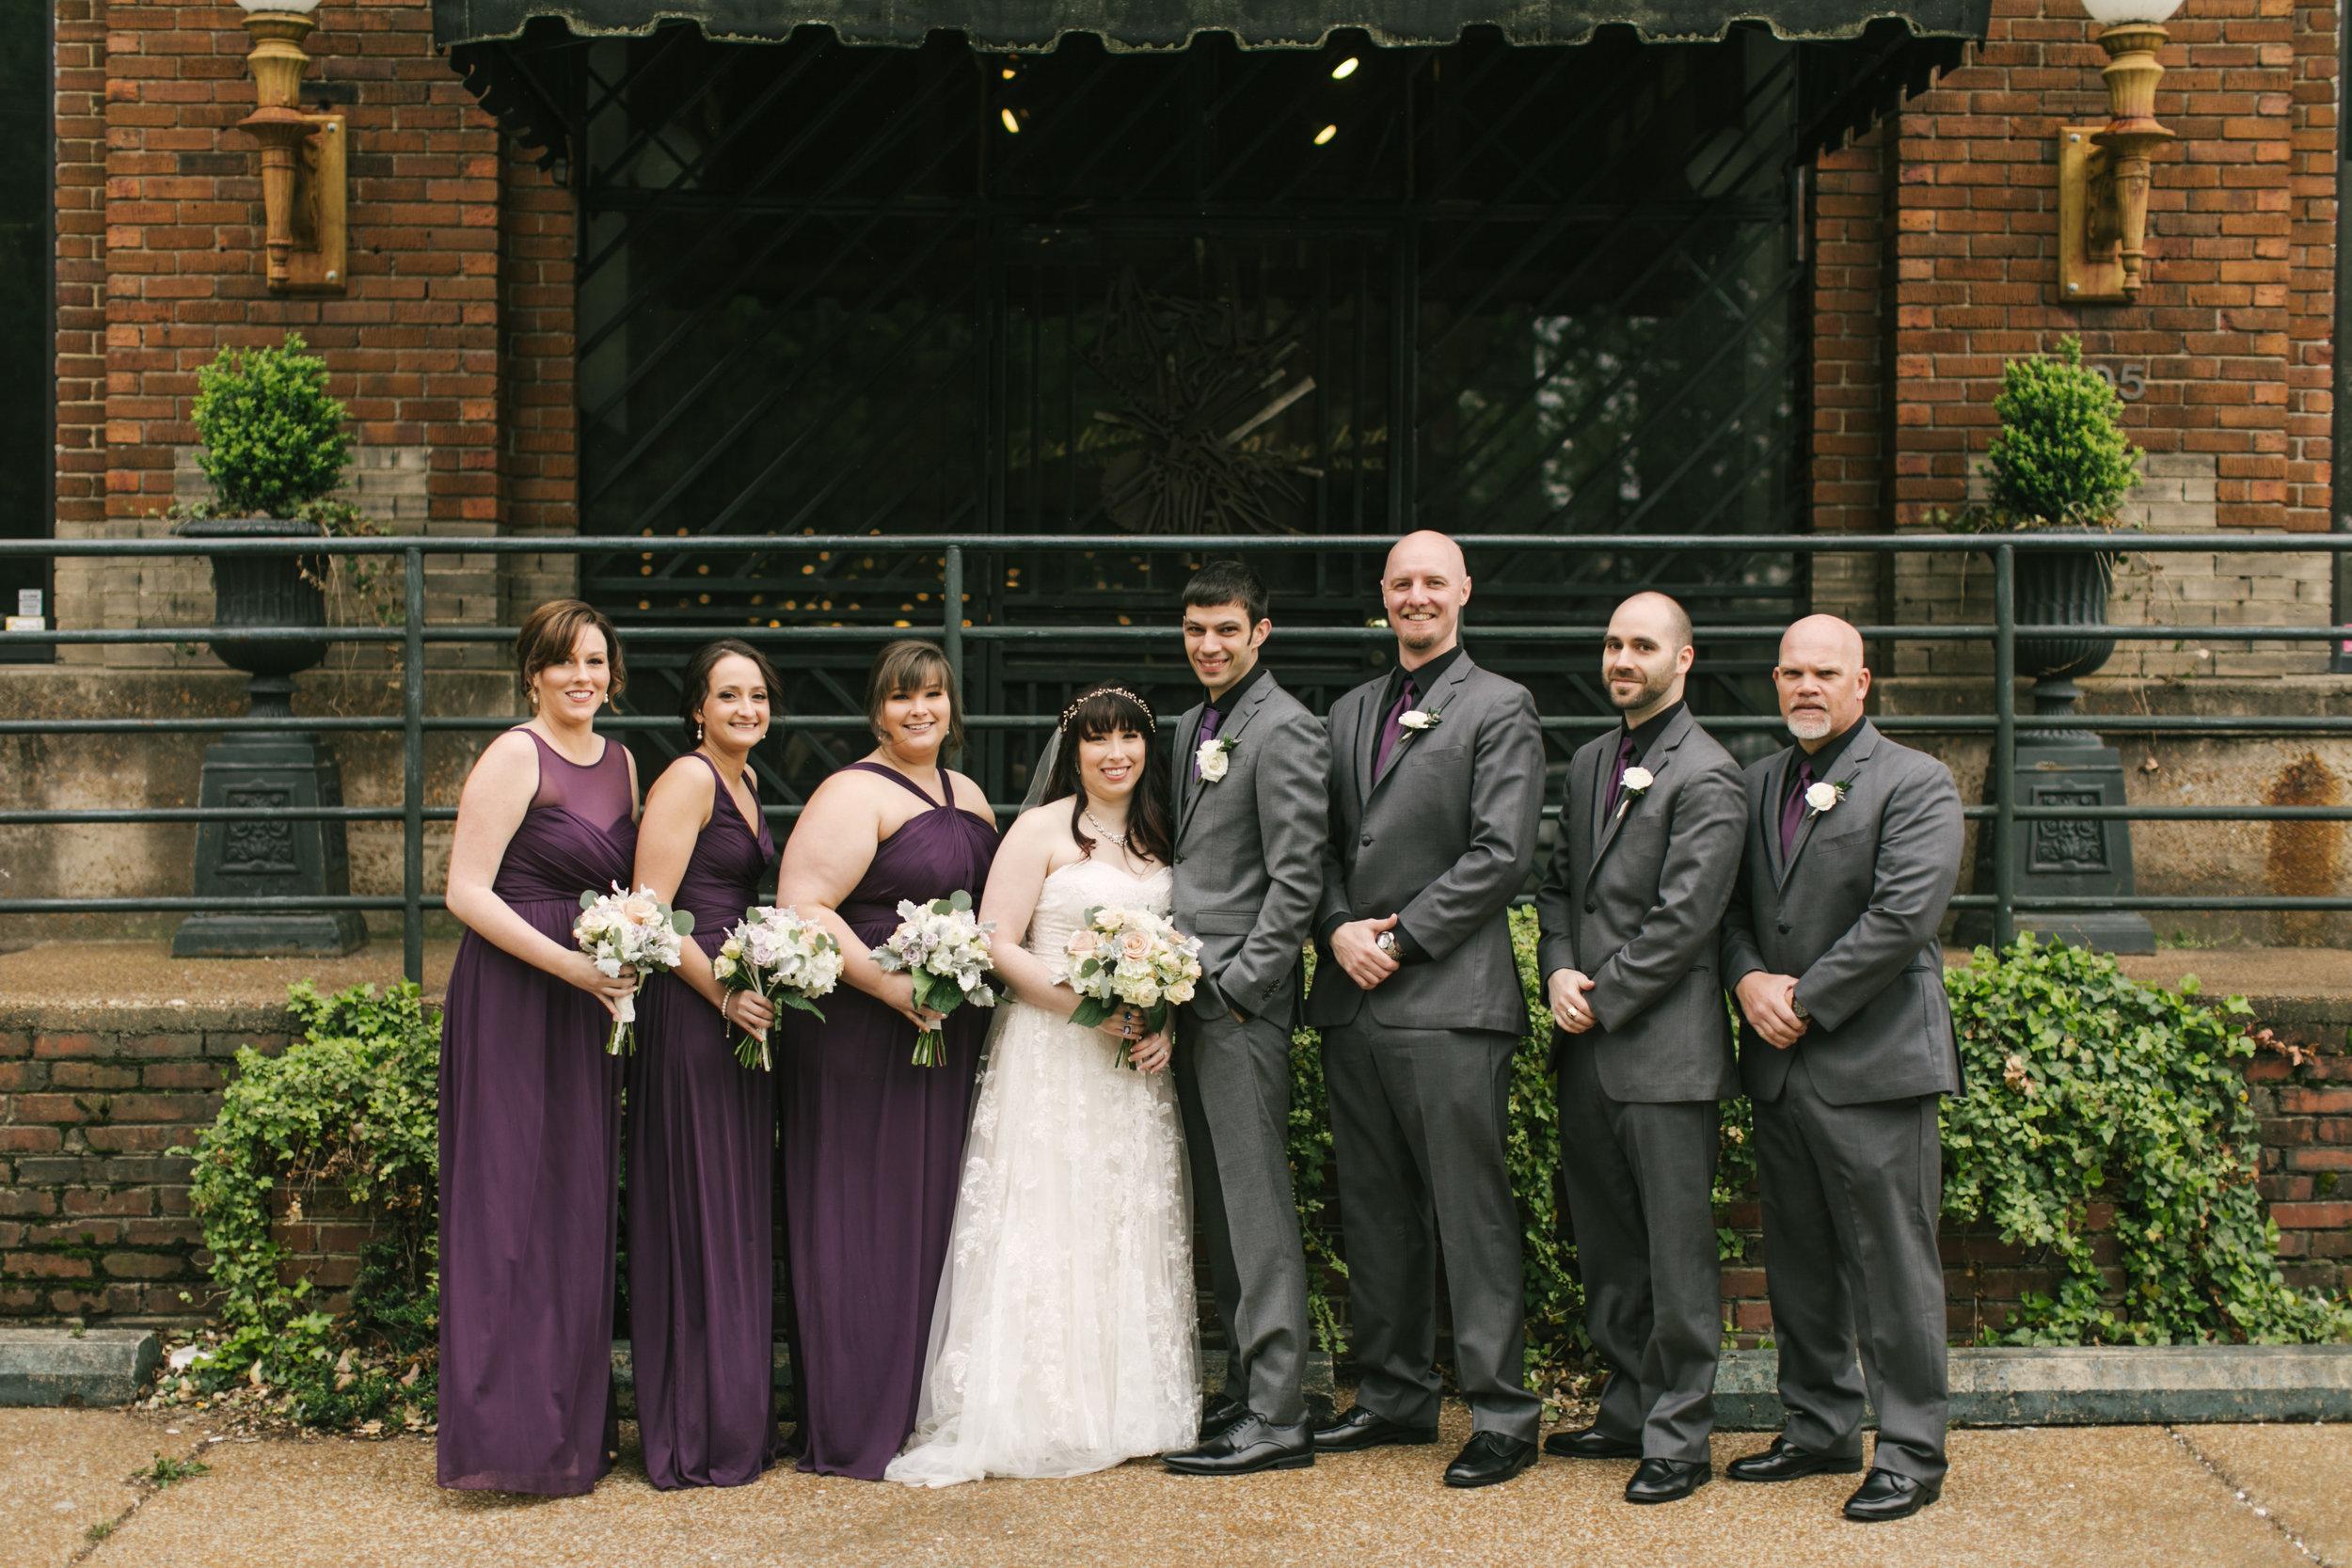 344_Colin+Jessica_Wedding.jpg